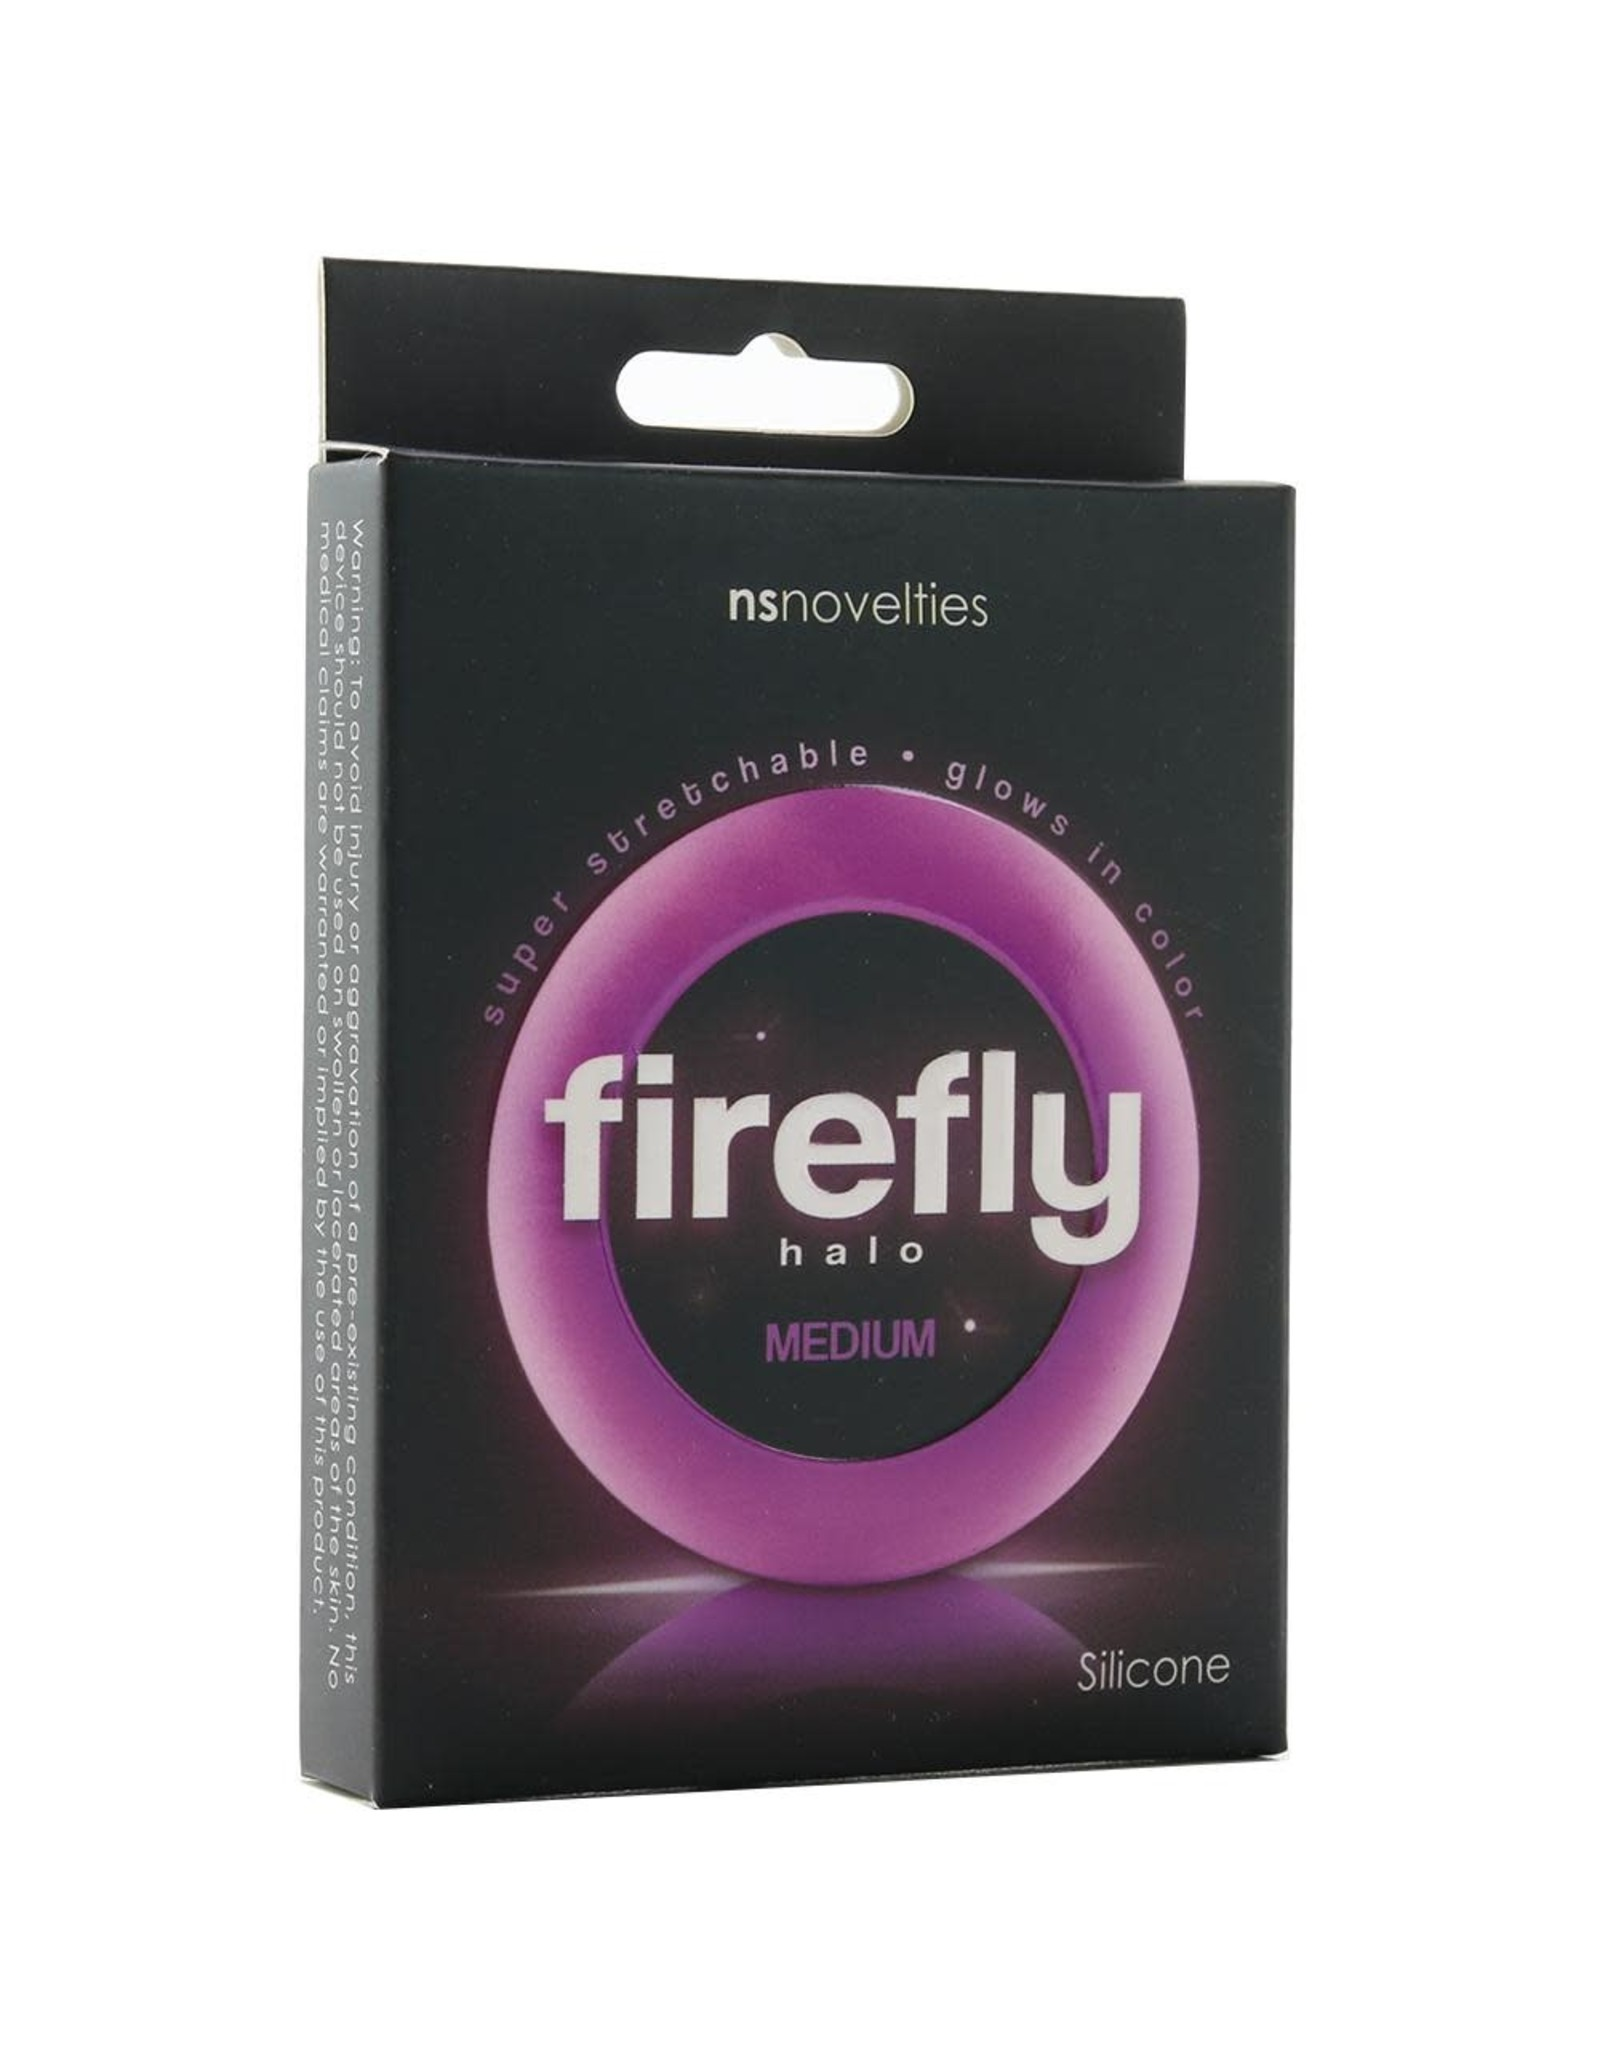 Firefly Halo - Medium Cock Ring (purple)